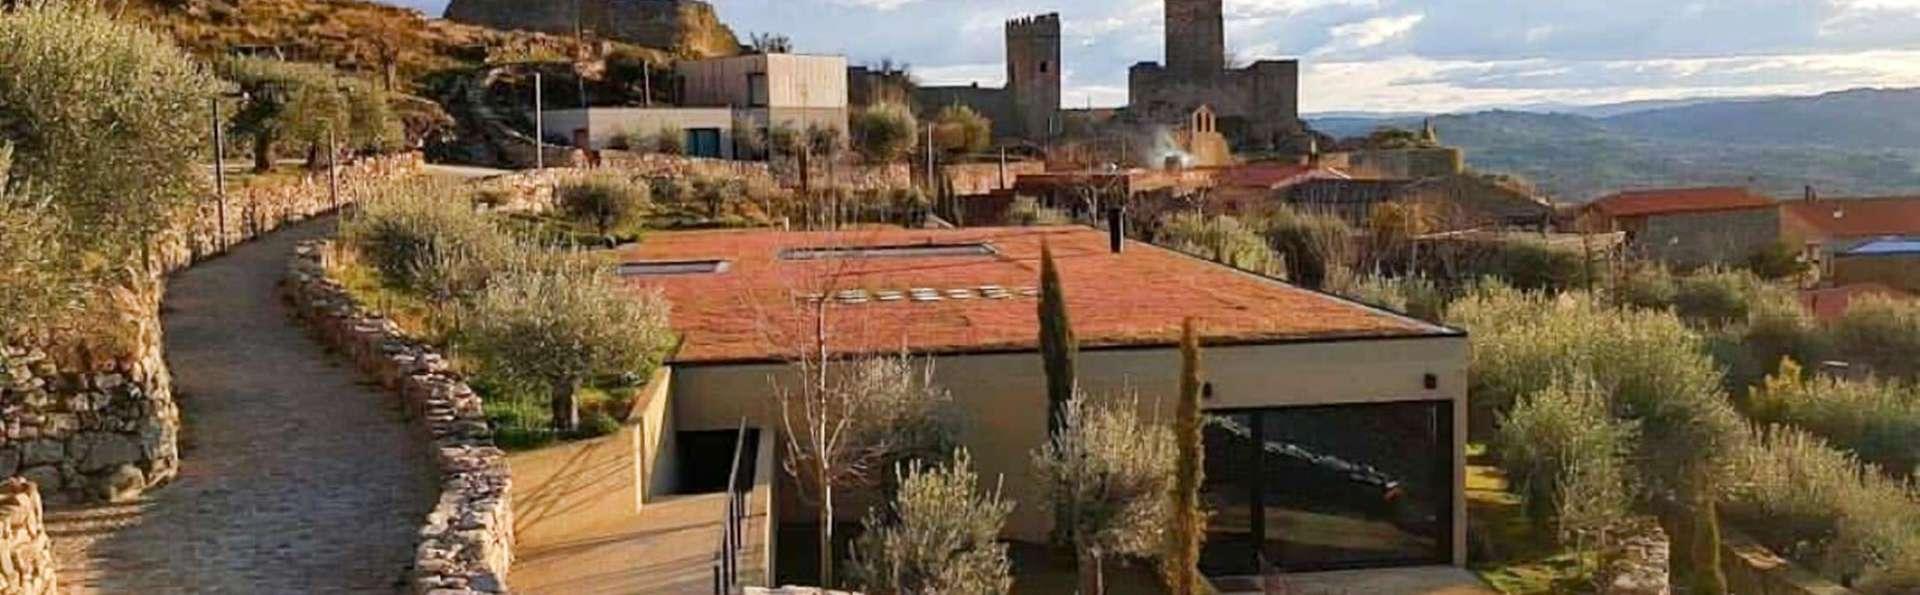 Casas do Côro - EDIT_FRONT_03.jpg